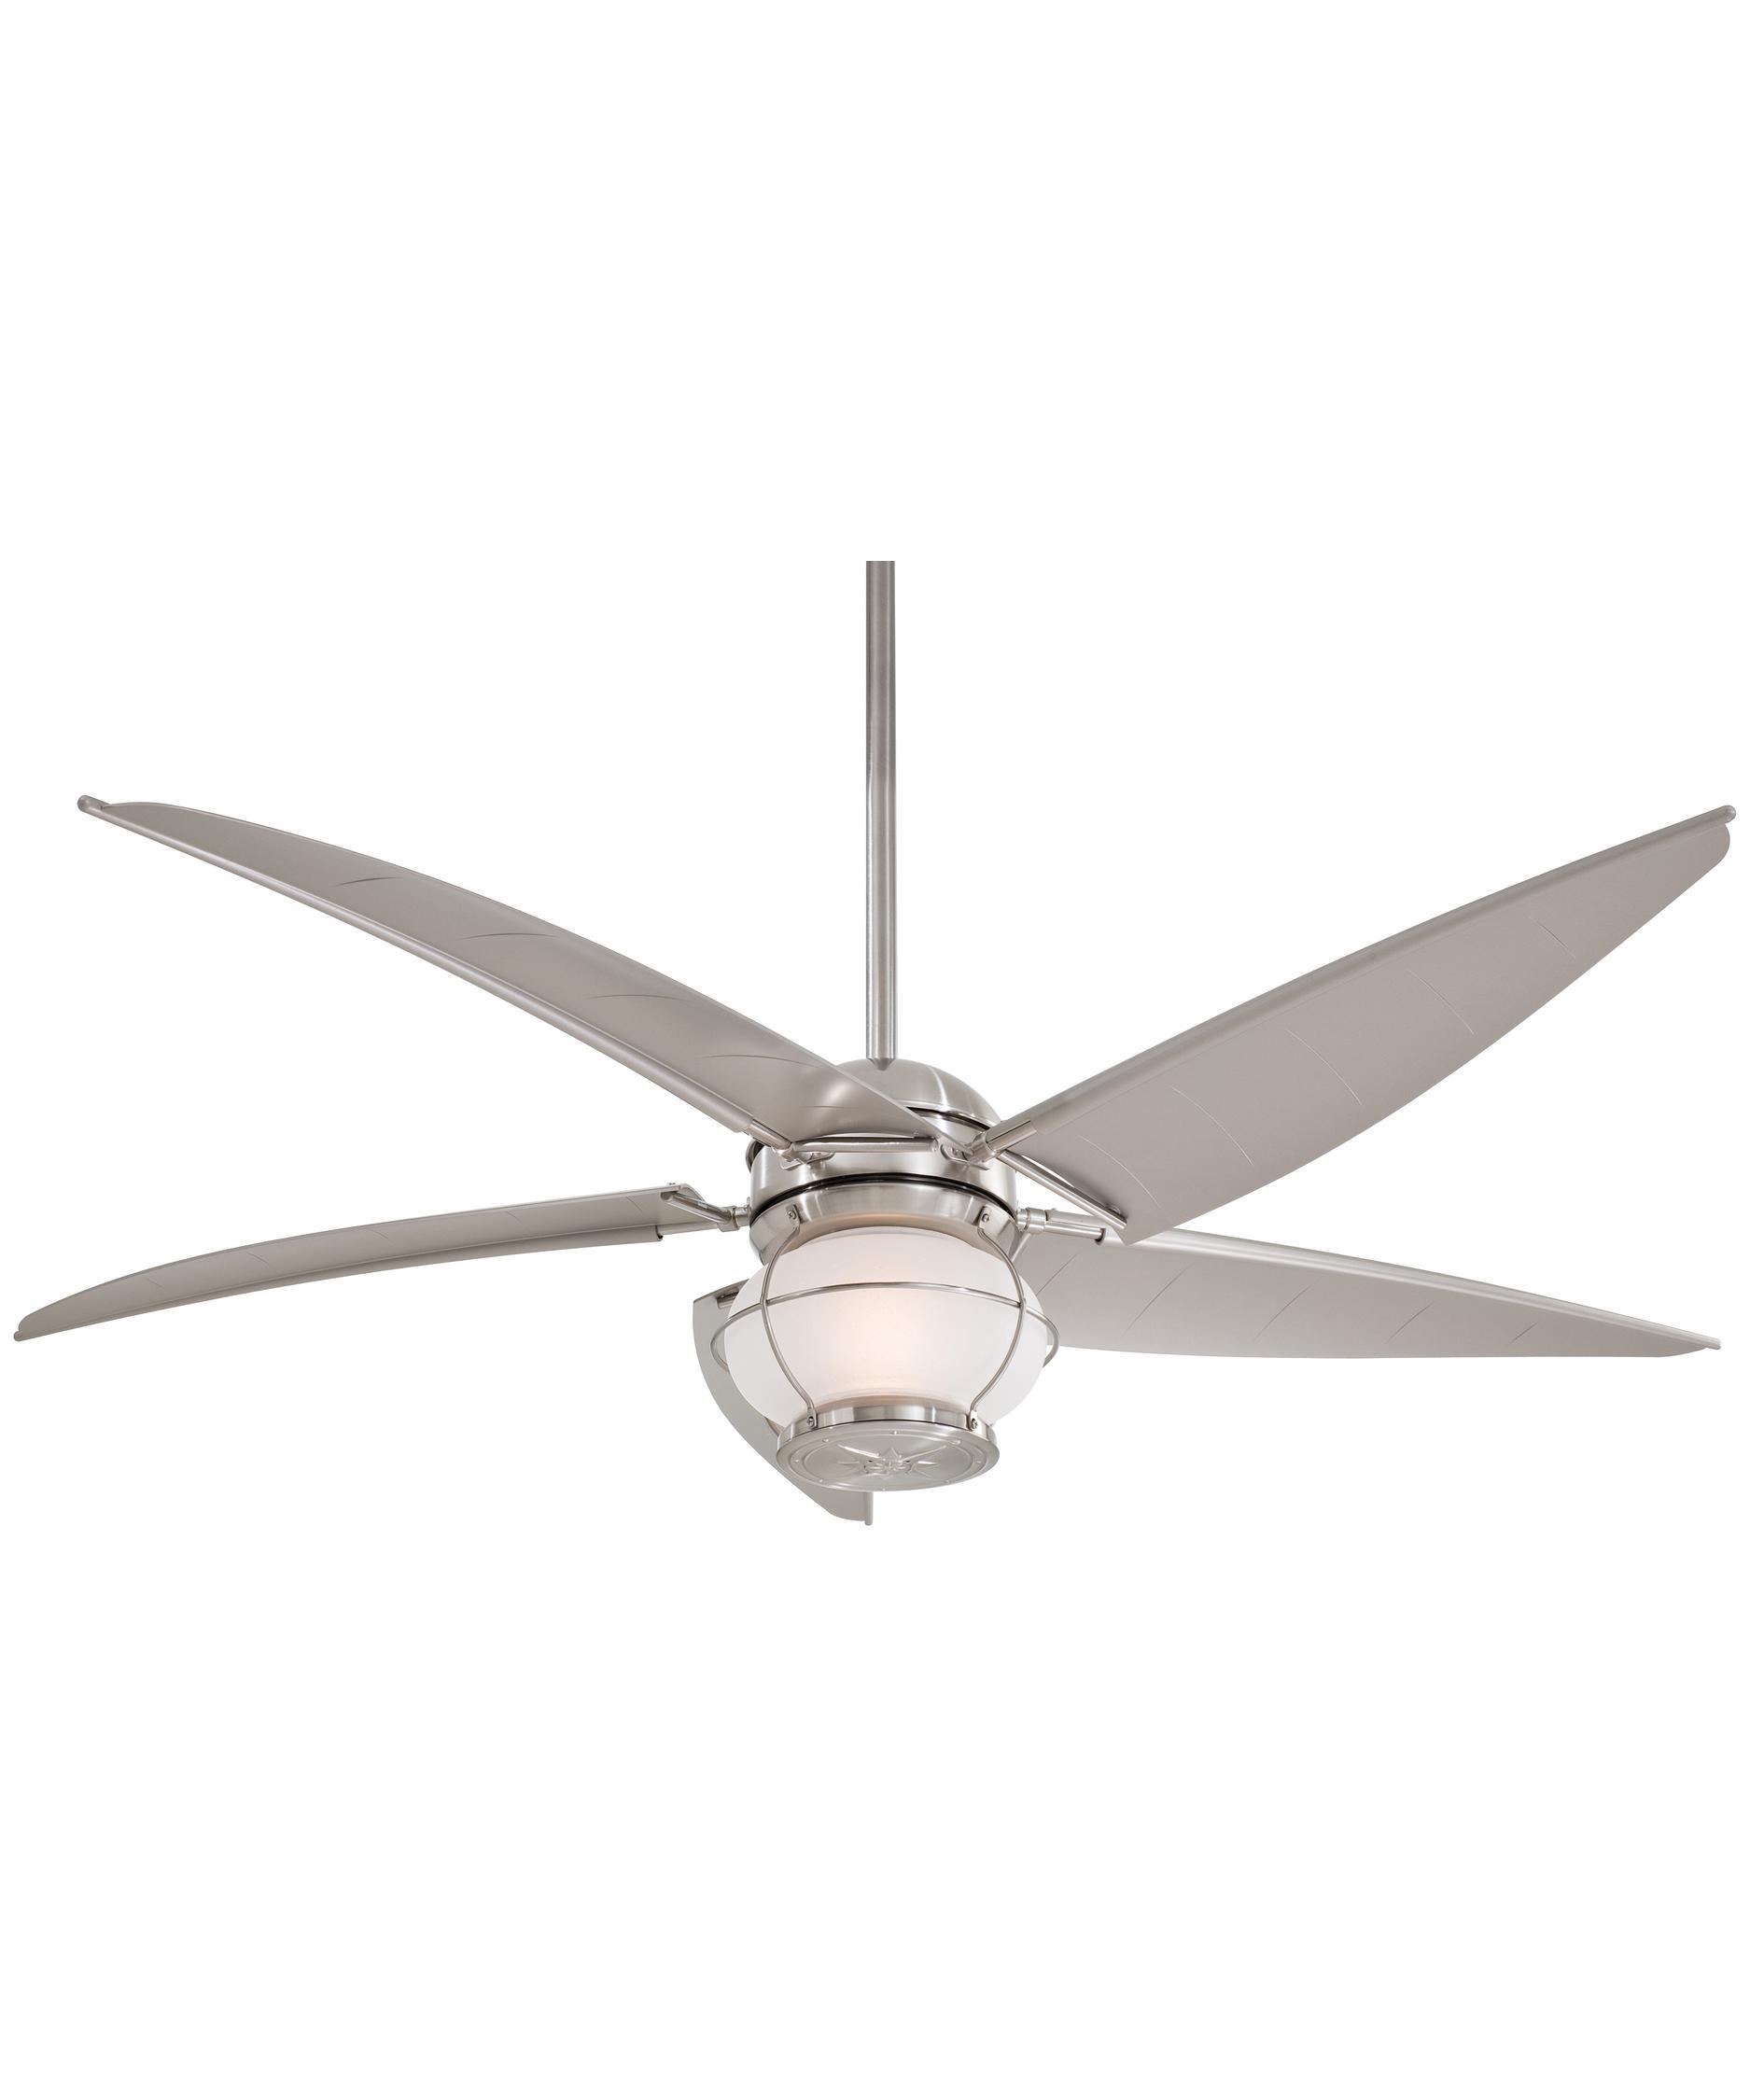 minka aire f579 magellan 60 inch 5 blade ceiling fan | capitol